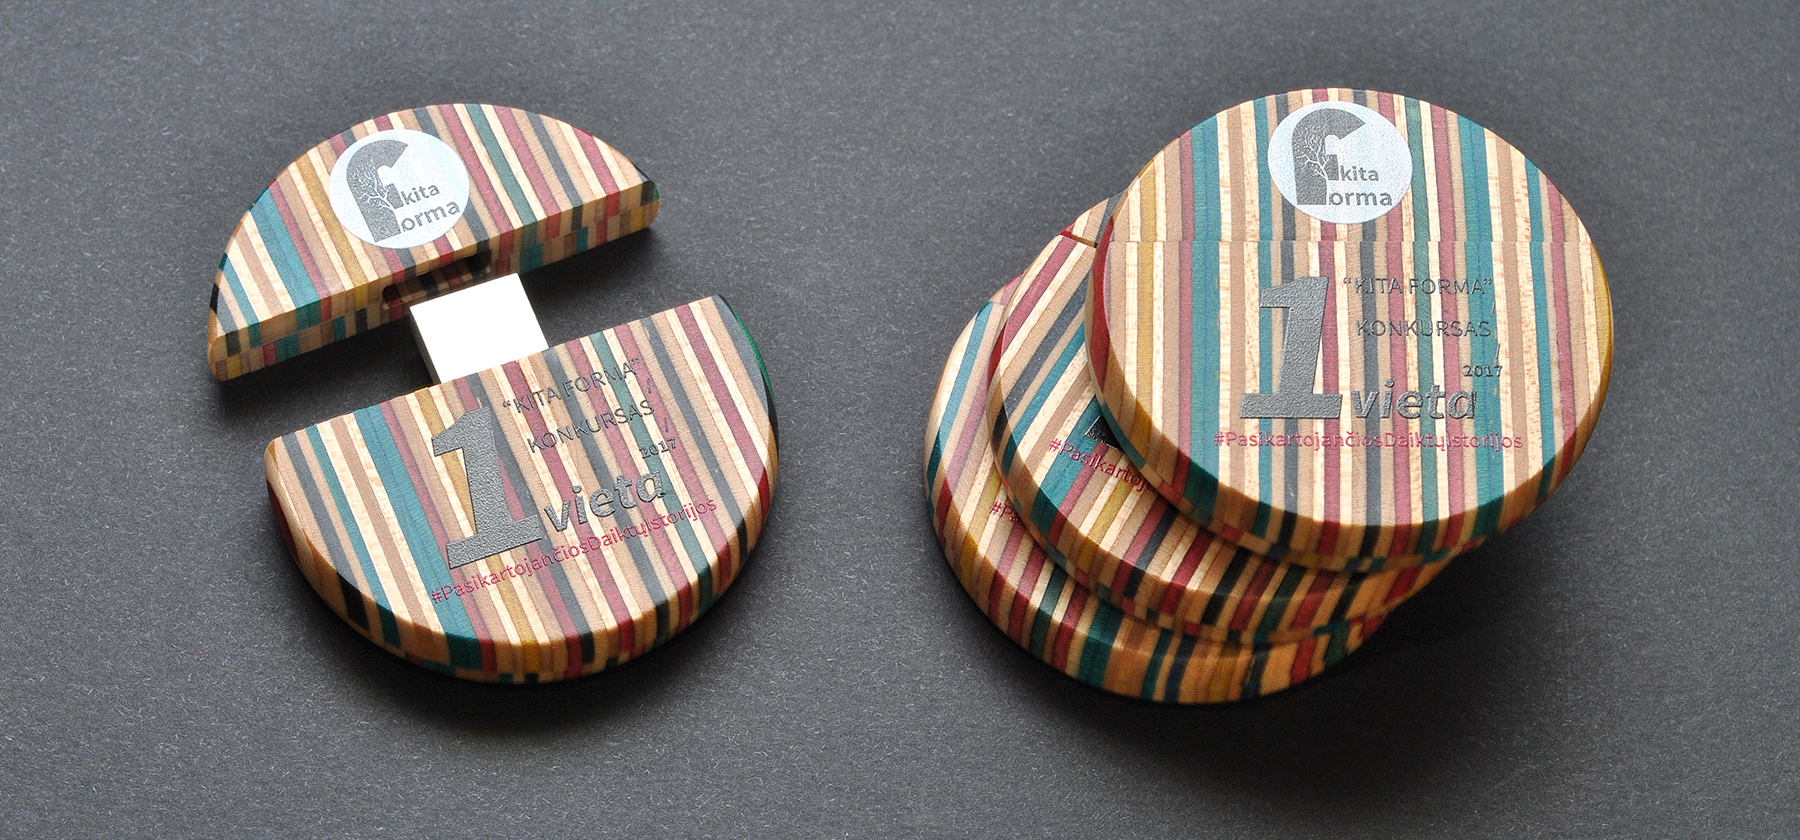 USB trophies